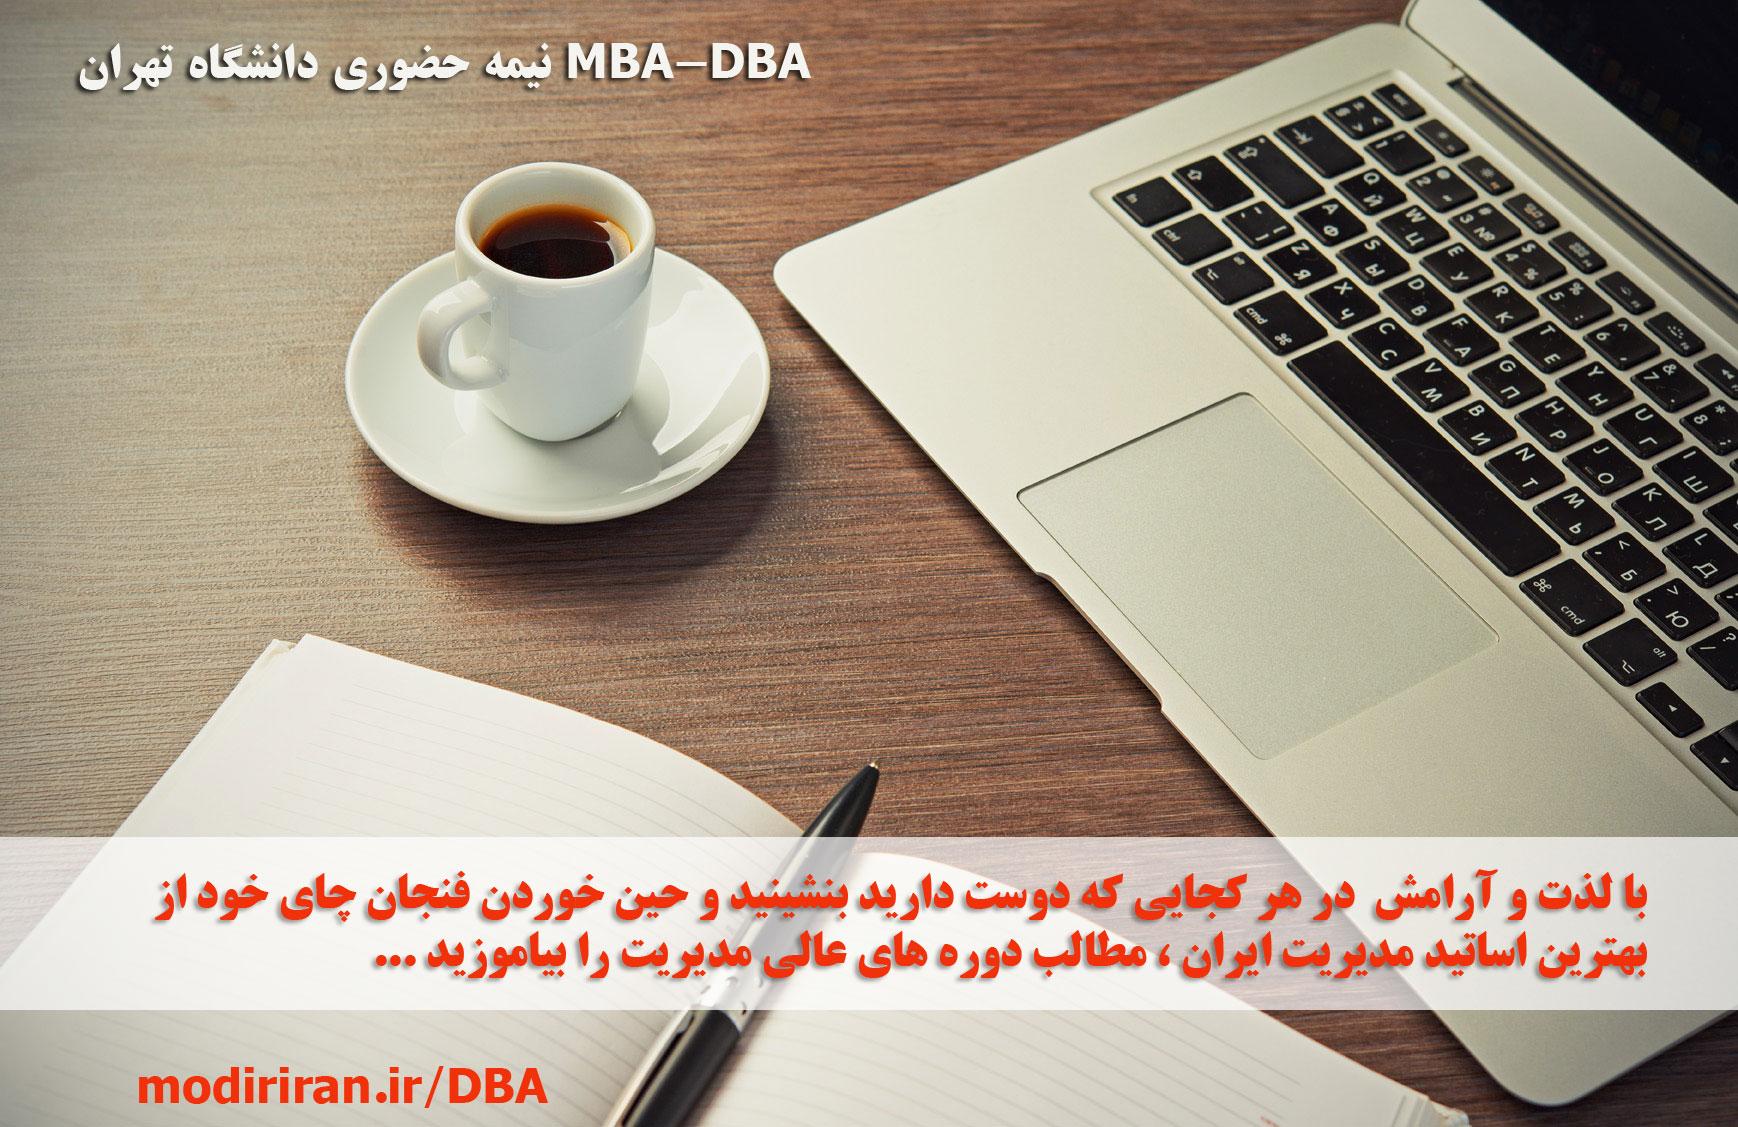 DBA-MBA